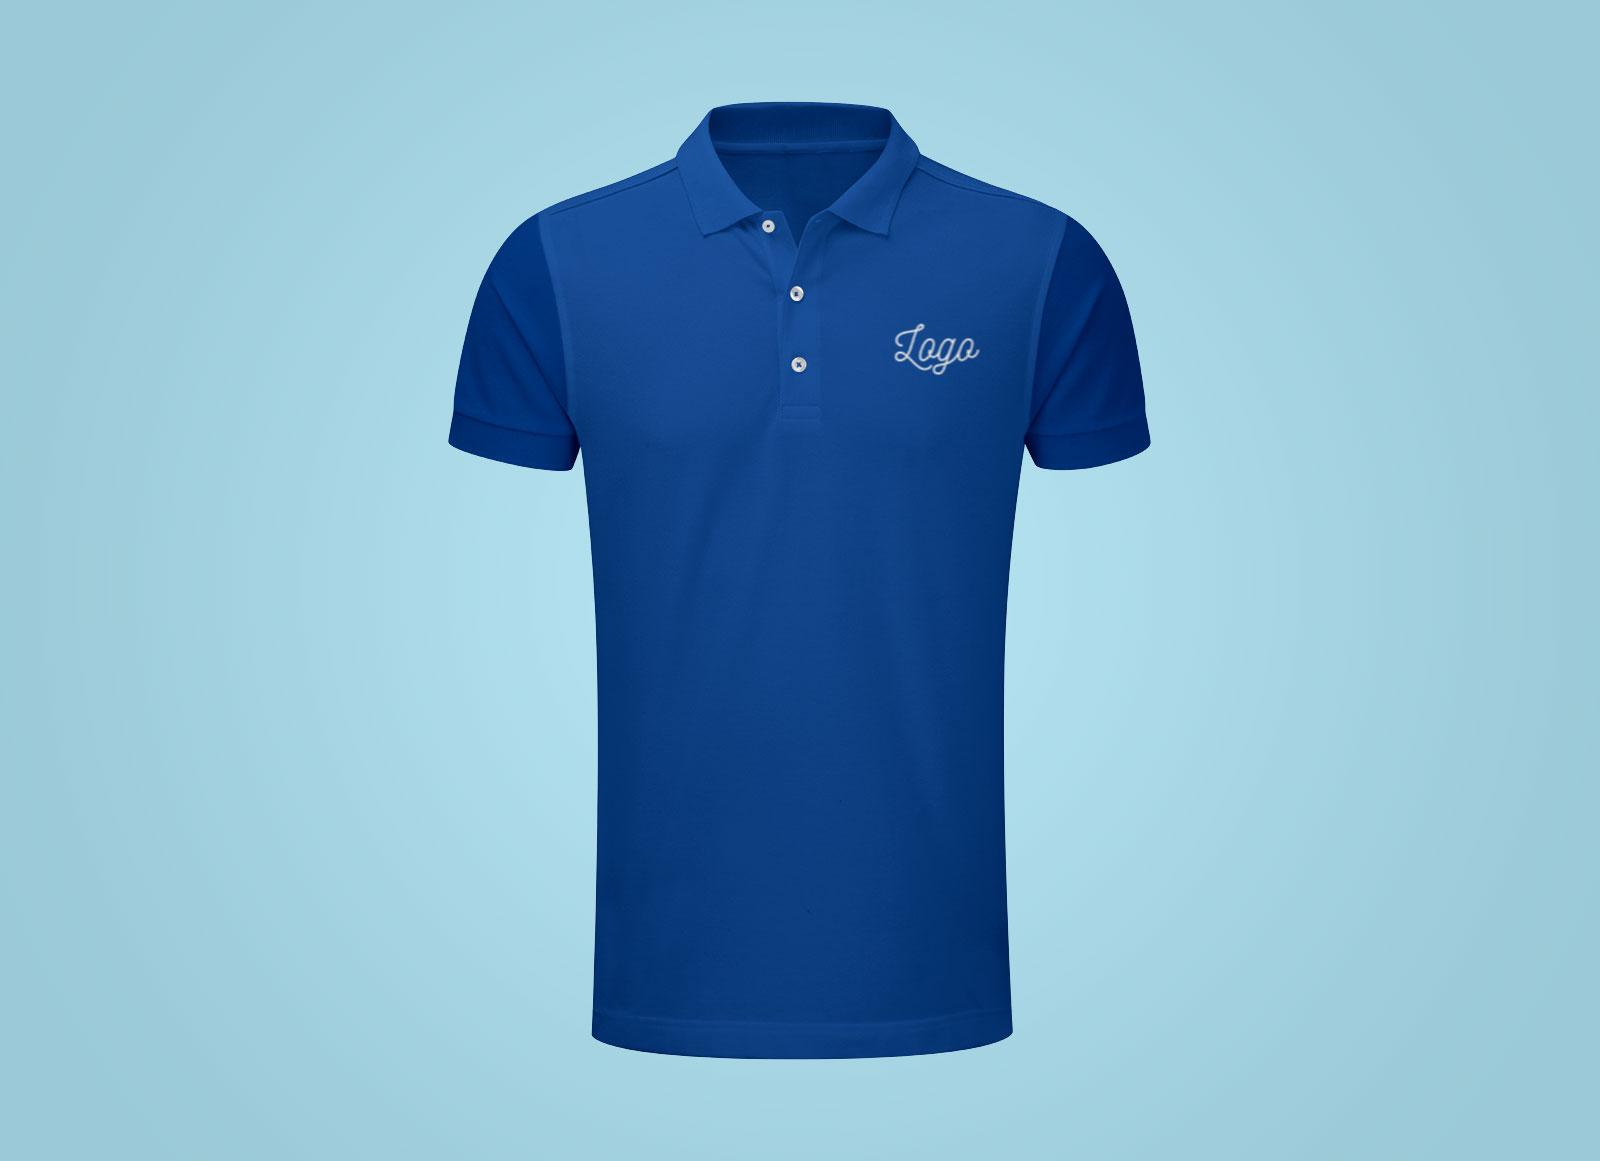 Free Fully Customizable Half Sleeves Polo T Shirt Mockup